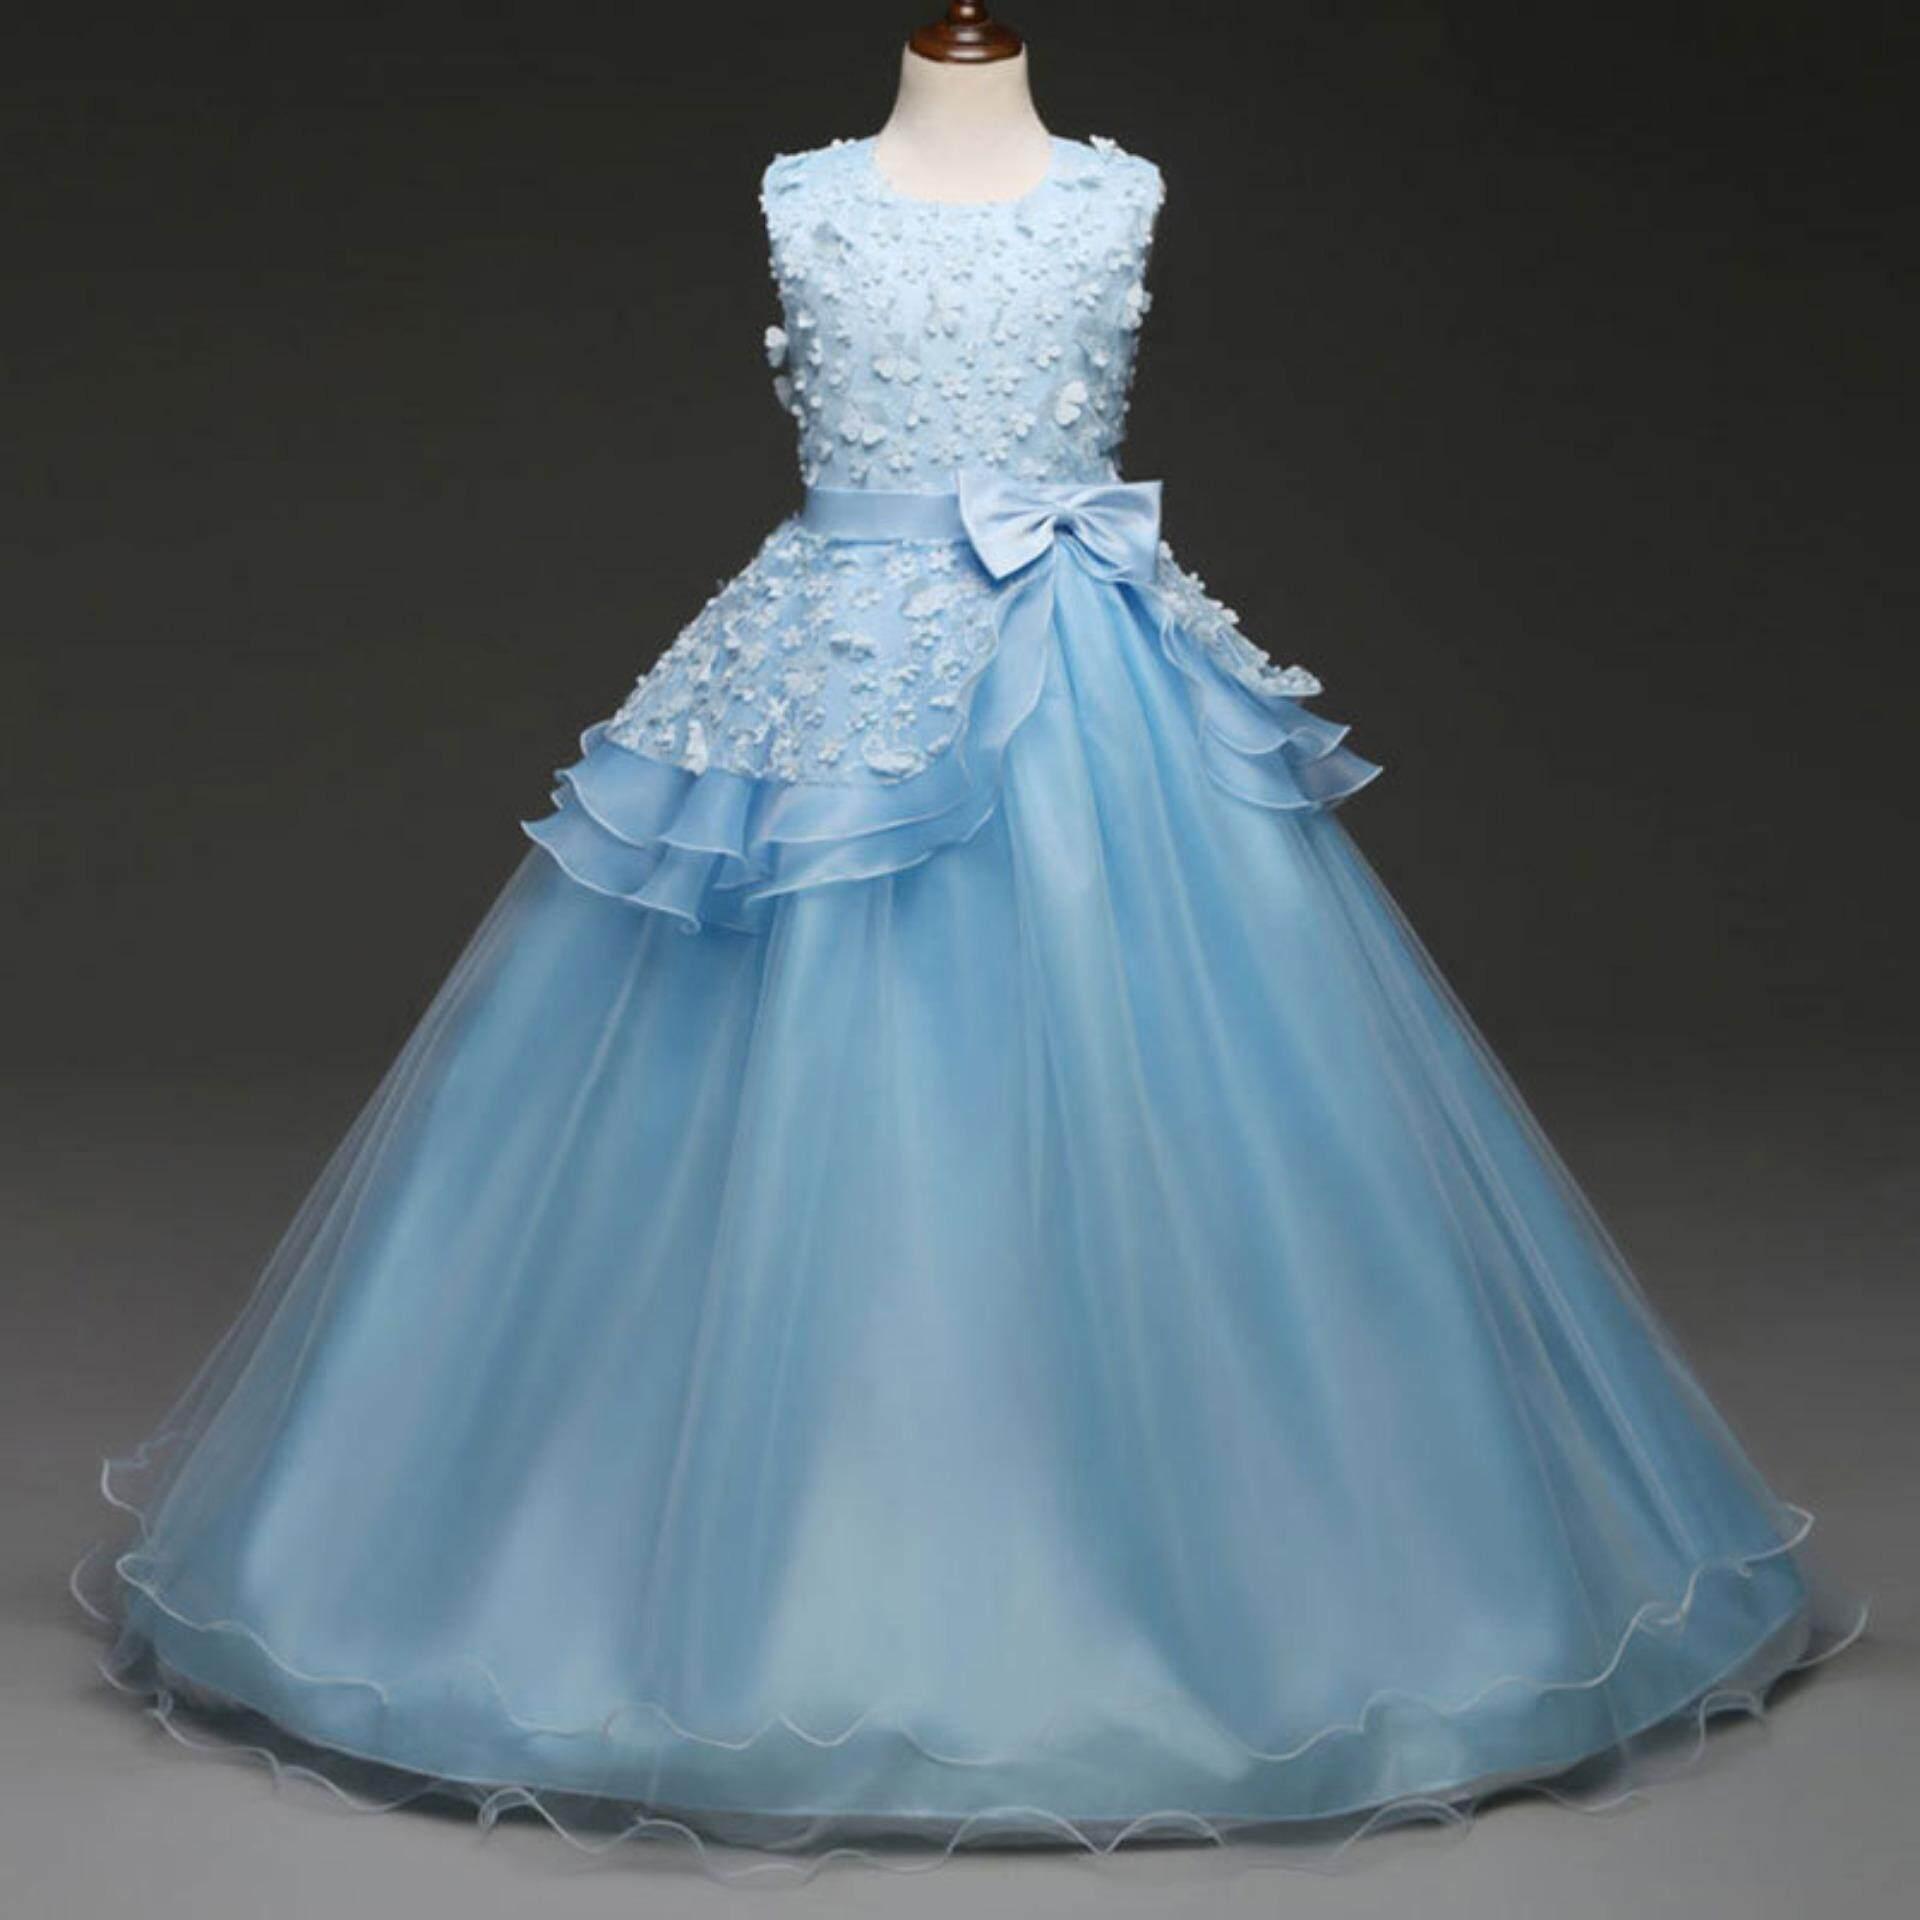 Girls Dresses - Buy Girls Dresses at Best Price in Singapore | www ...